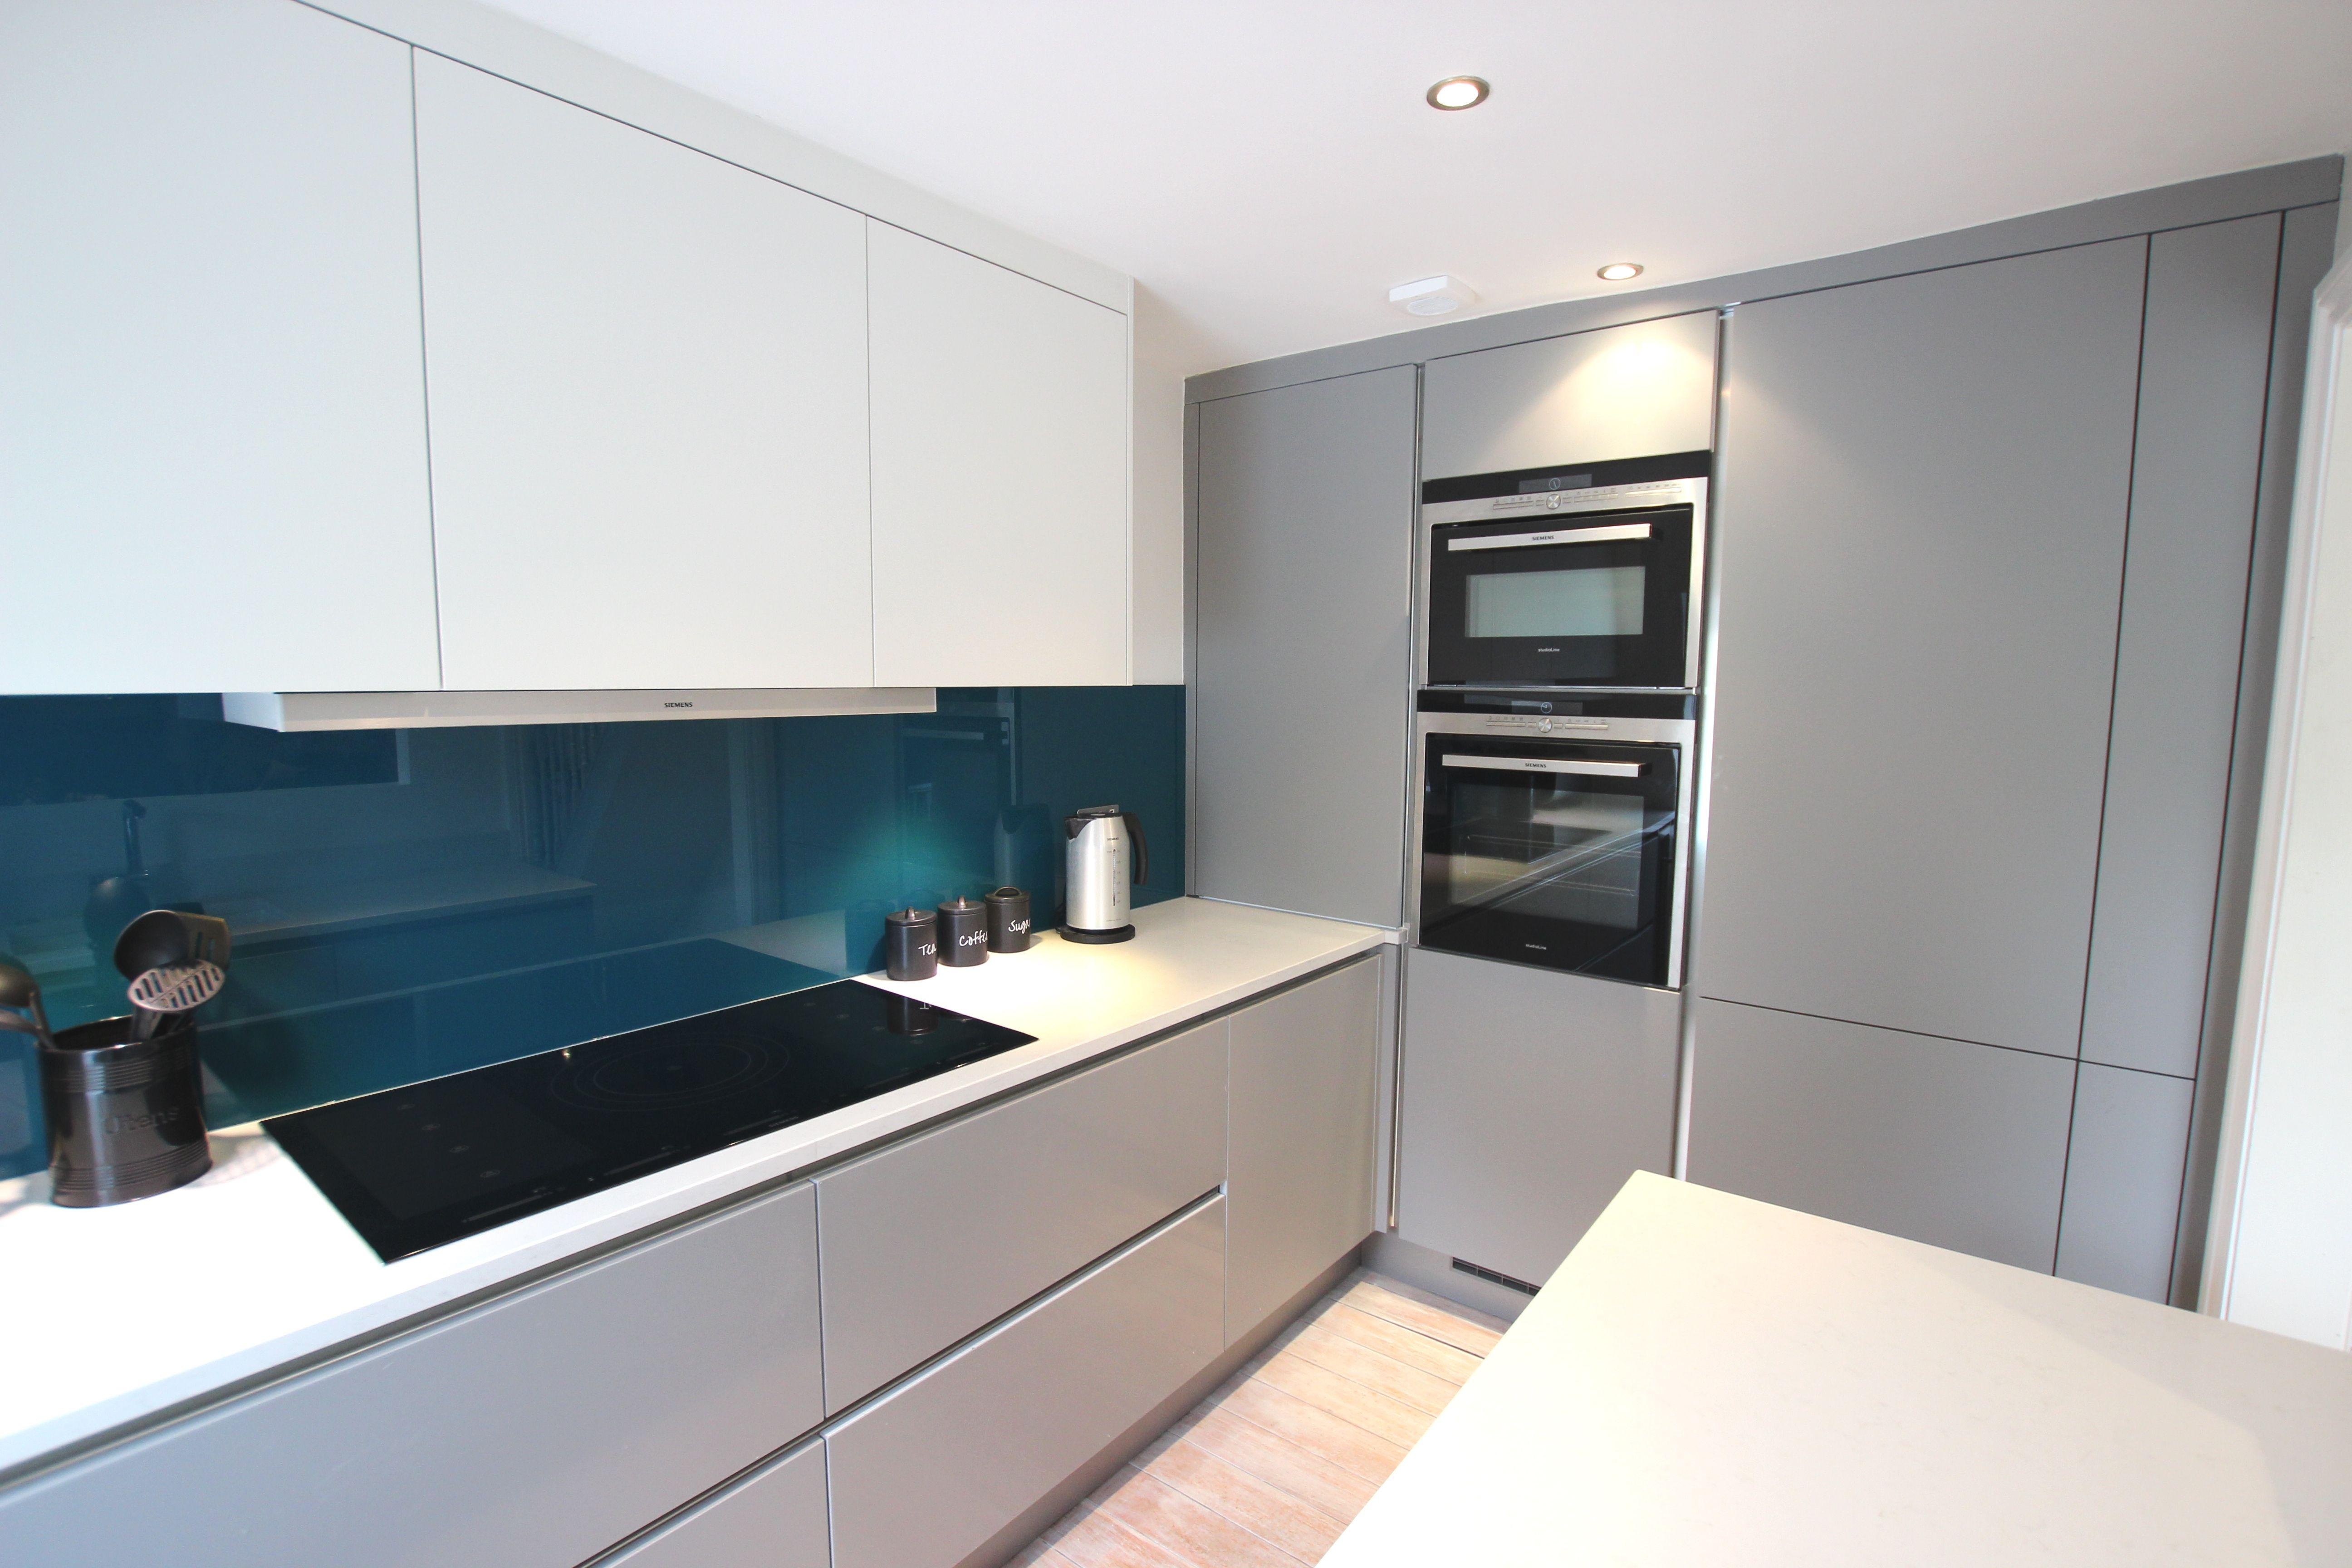 Best Kitchen Splashbacks From Lwk Kitchens Handleless Kitchen 640 x 480